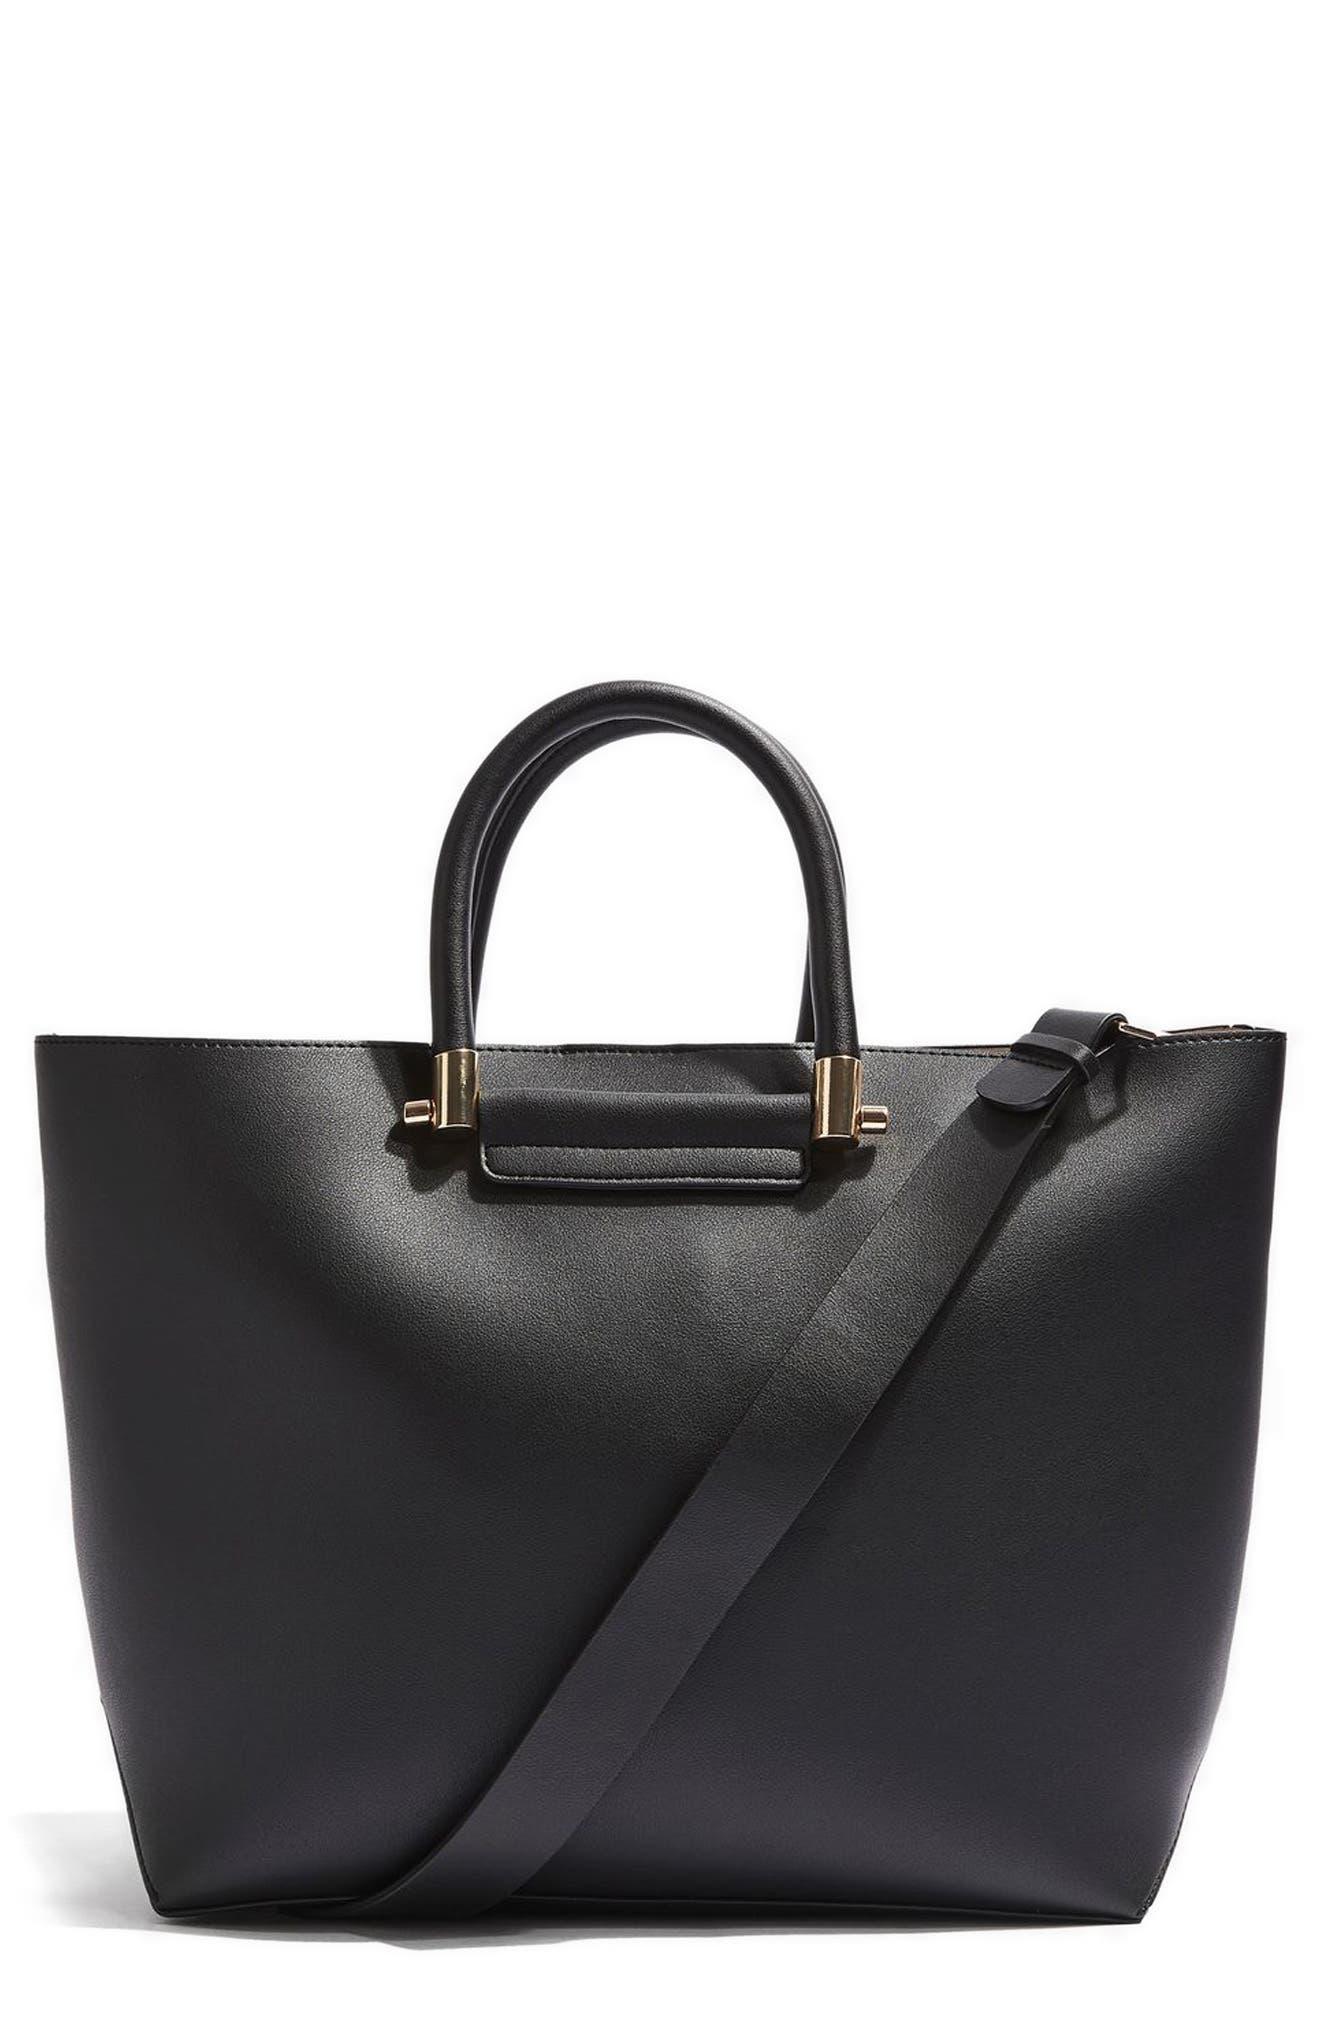 Topshop Simona Faux Leather Shopper